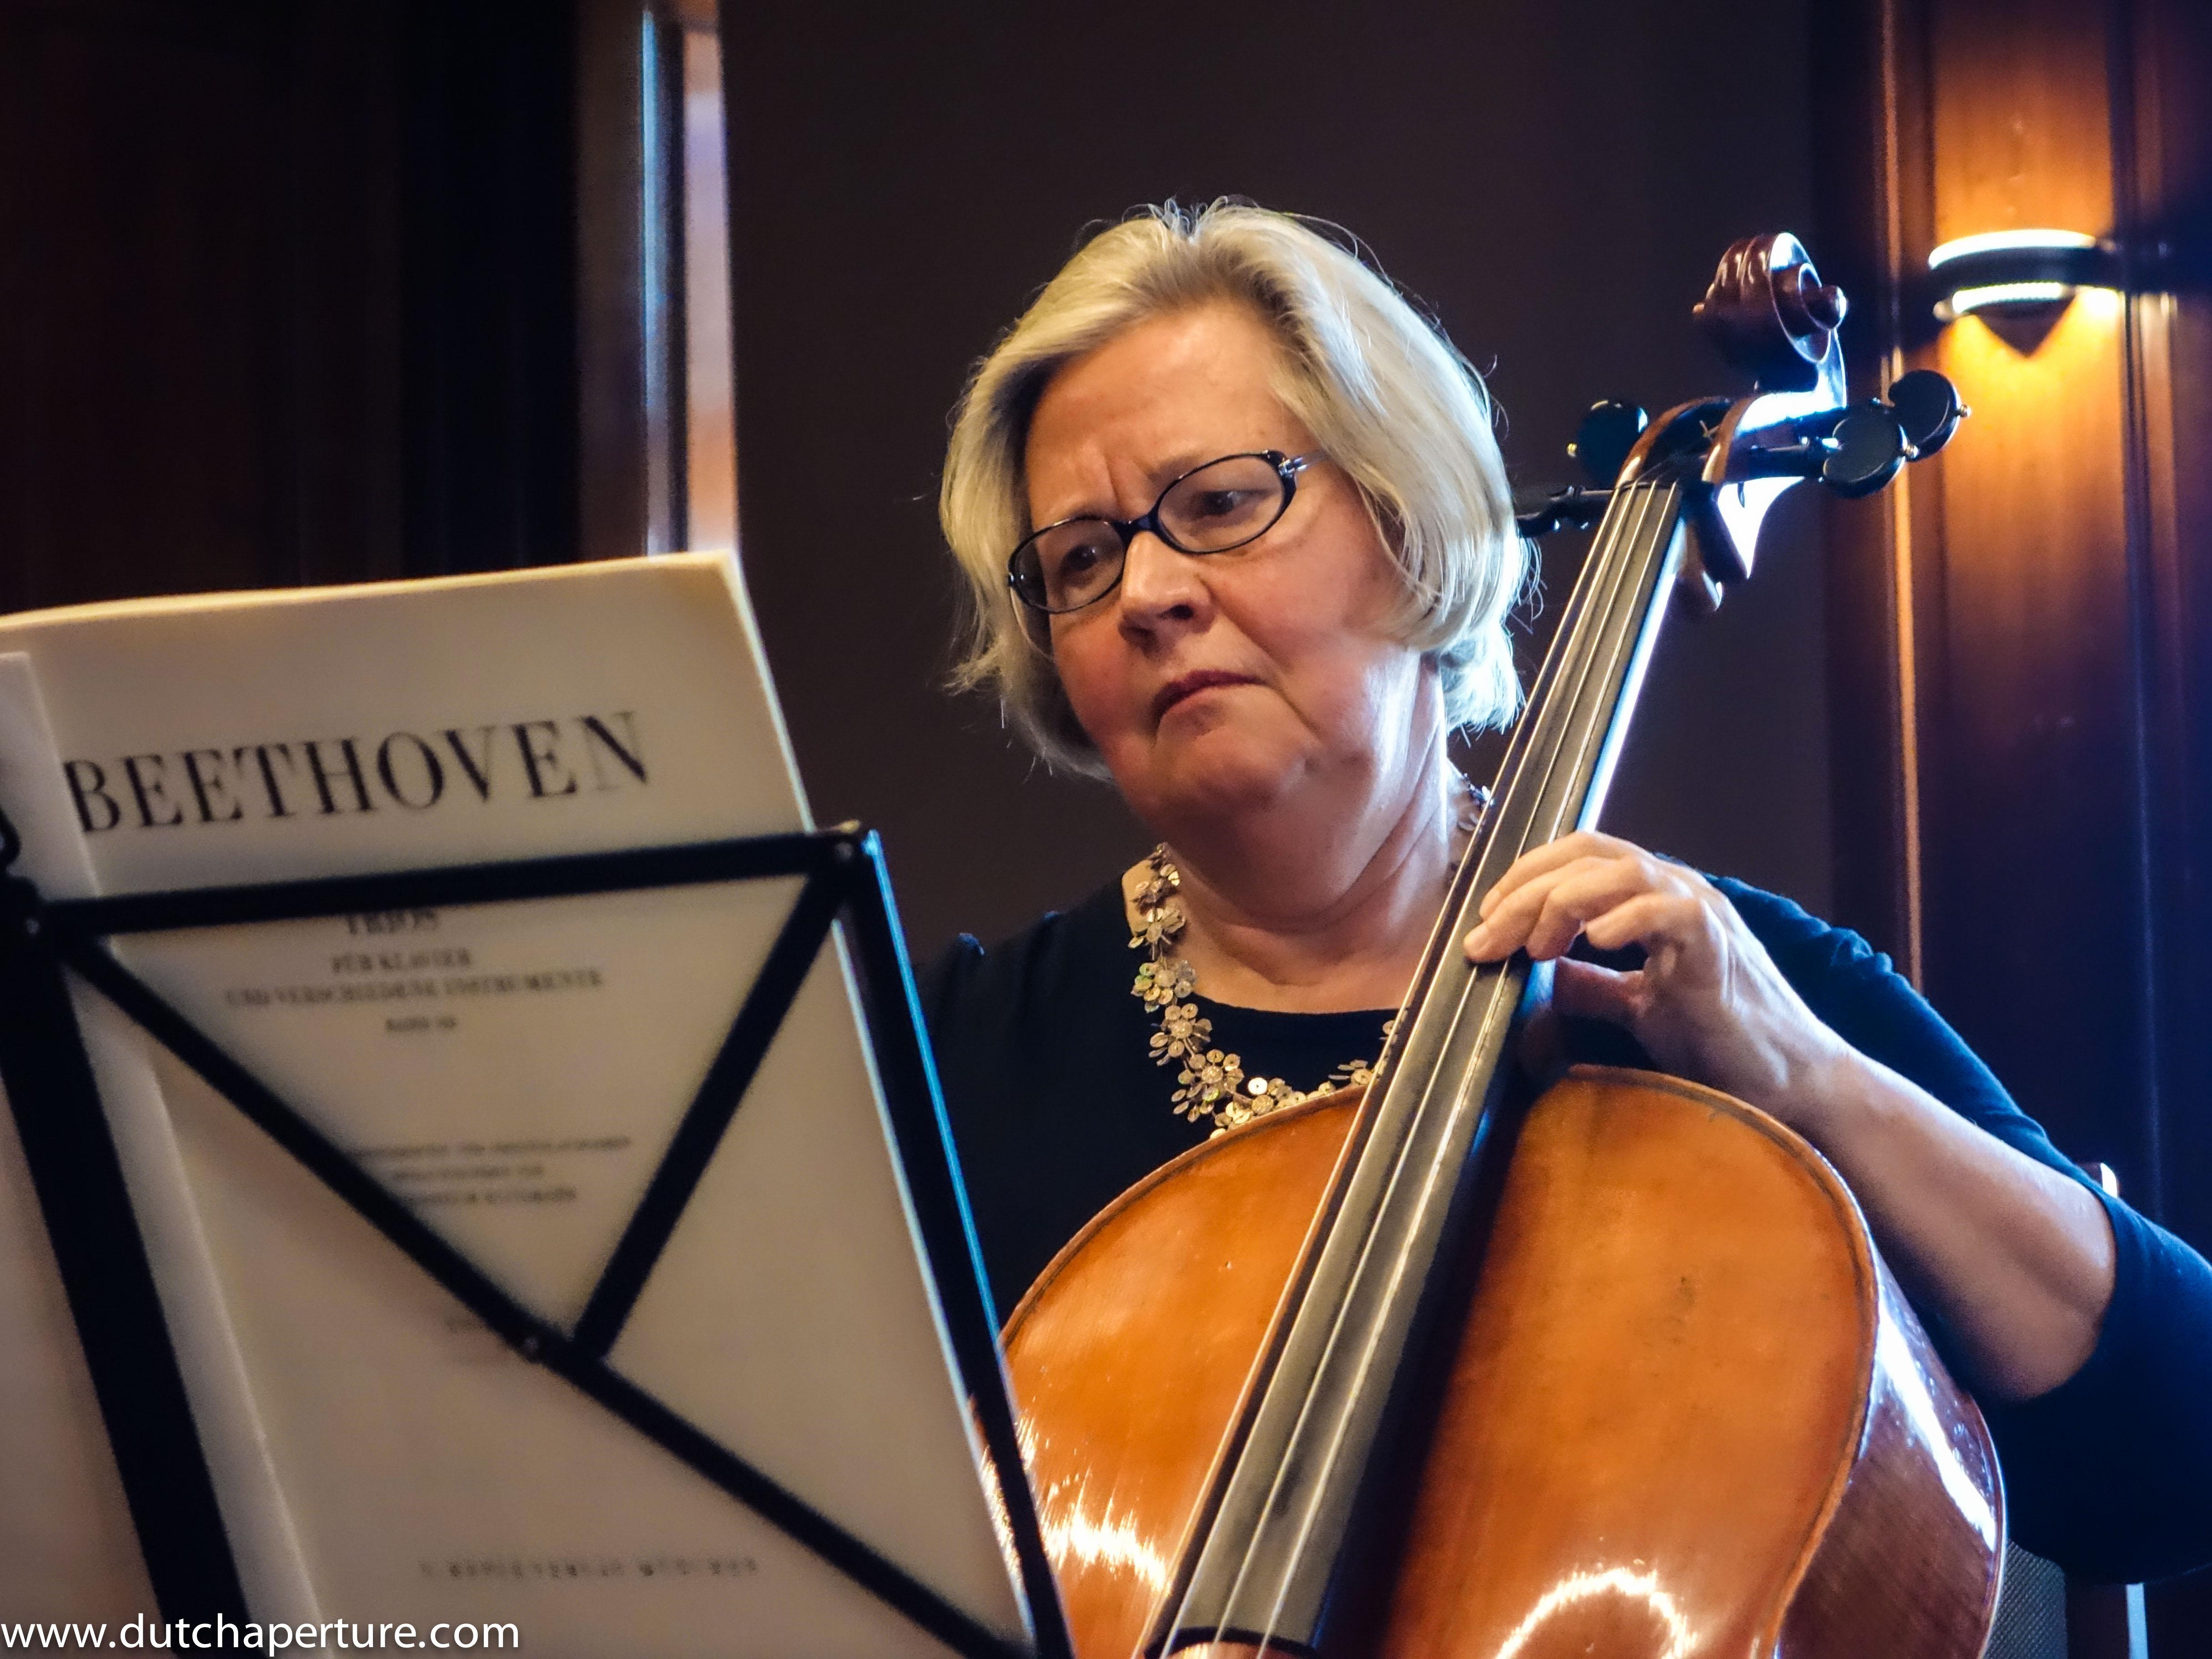 Bilder Concert Ayadin - Hopkins Marti - Hänni WP MP-8